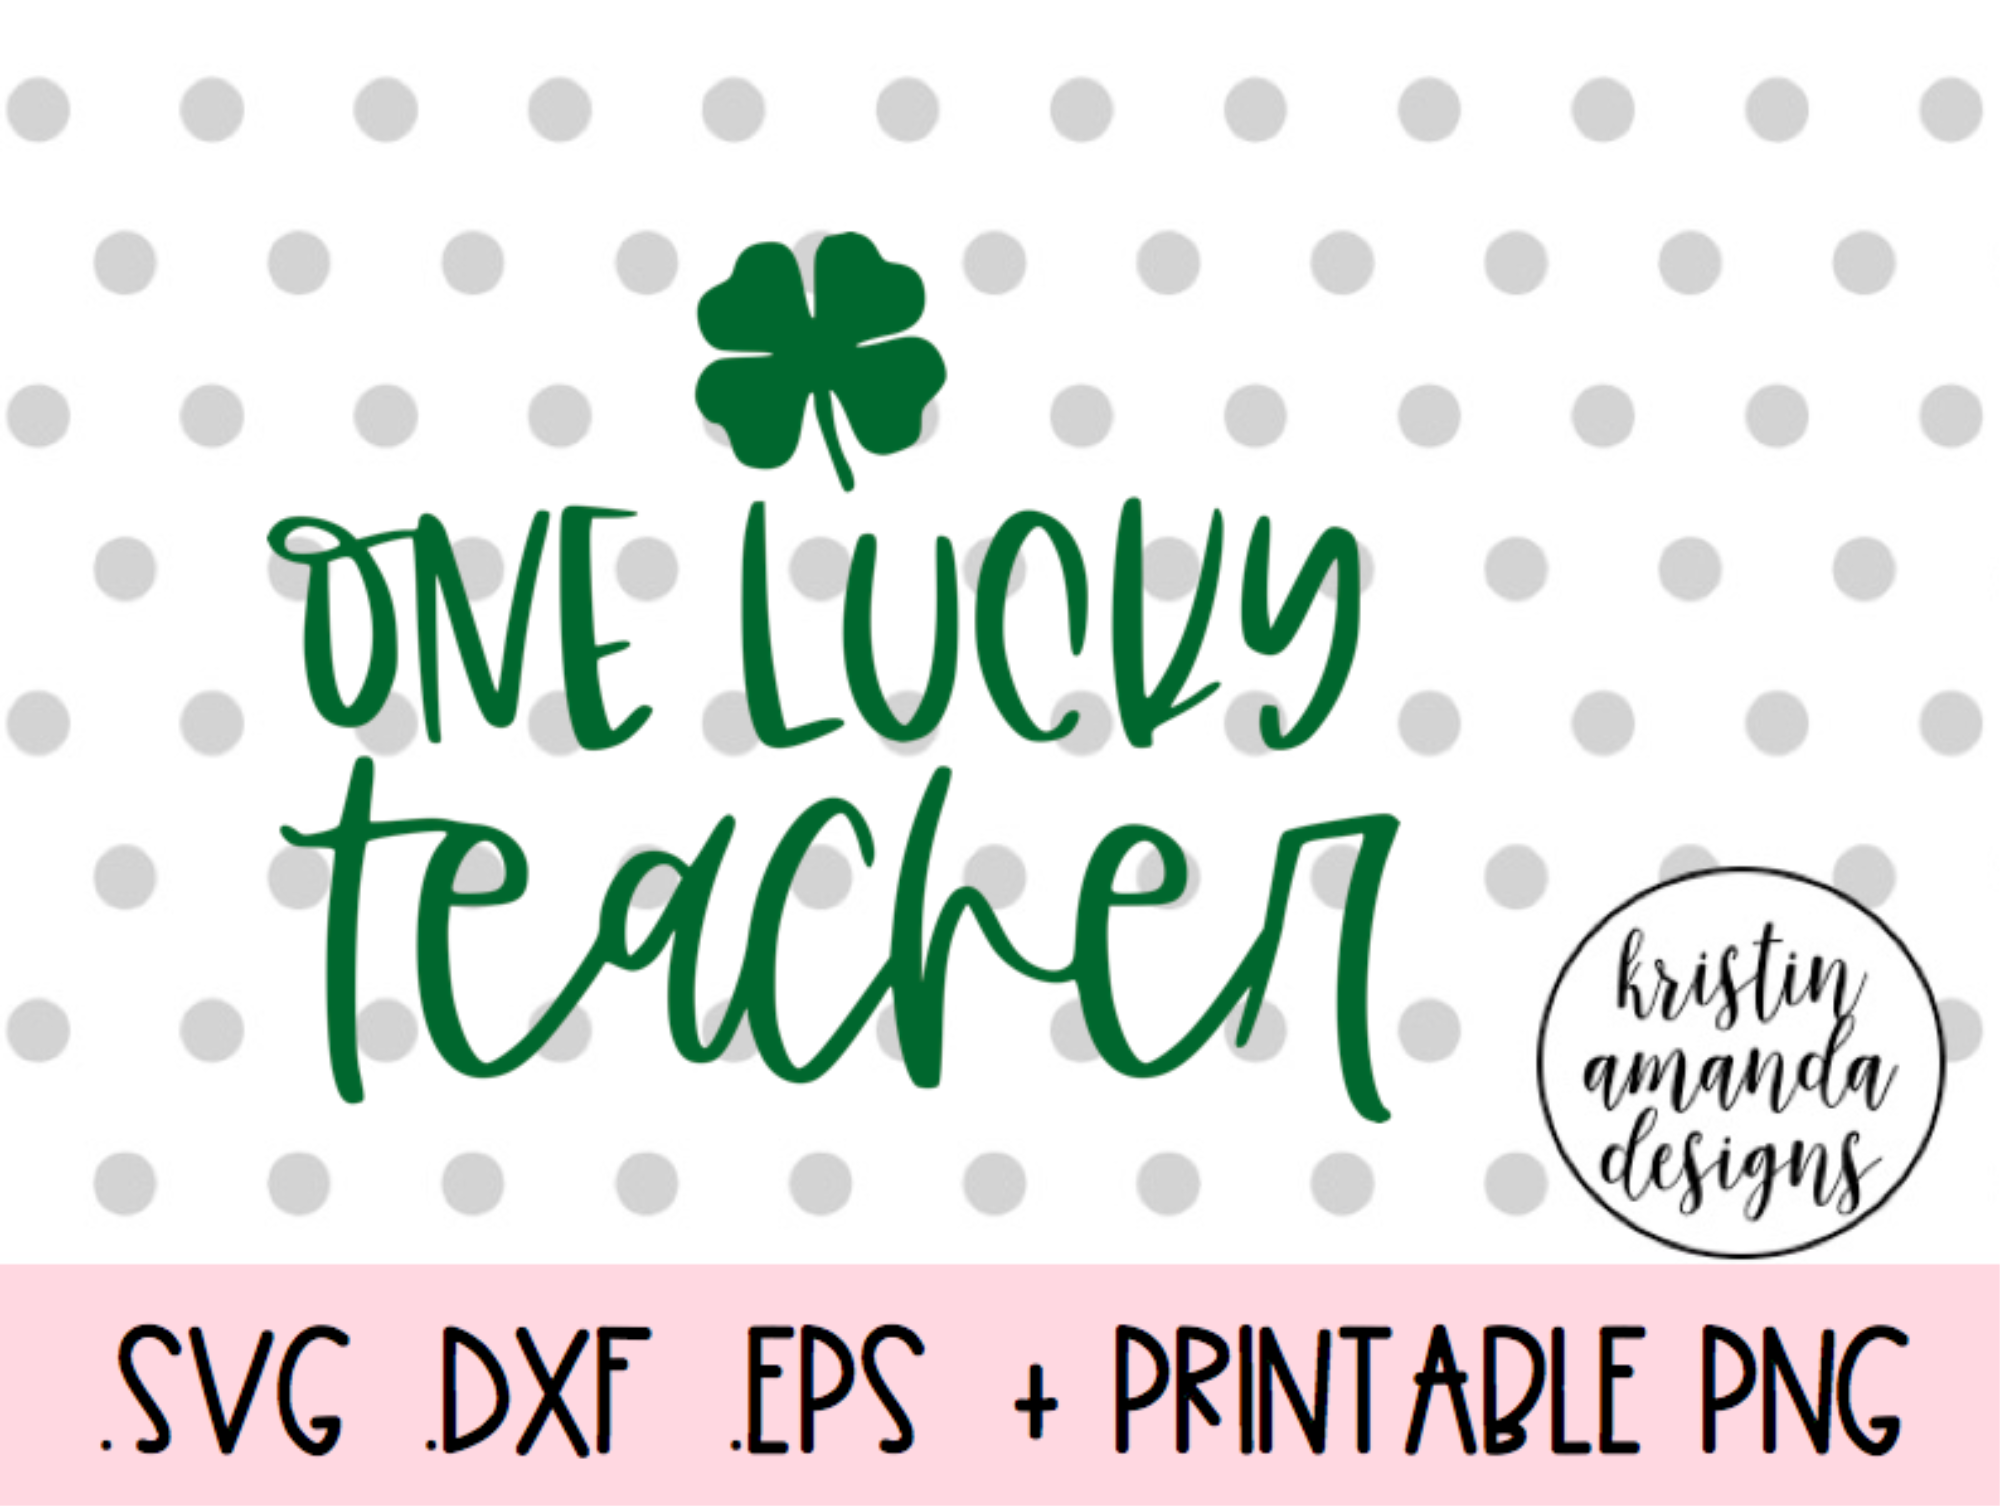 One Lucky Teacher St Patricks Day Svg Dxf Eps Png Cut File Cricut